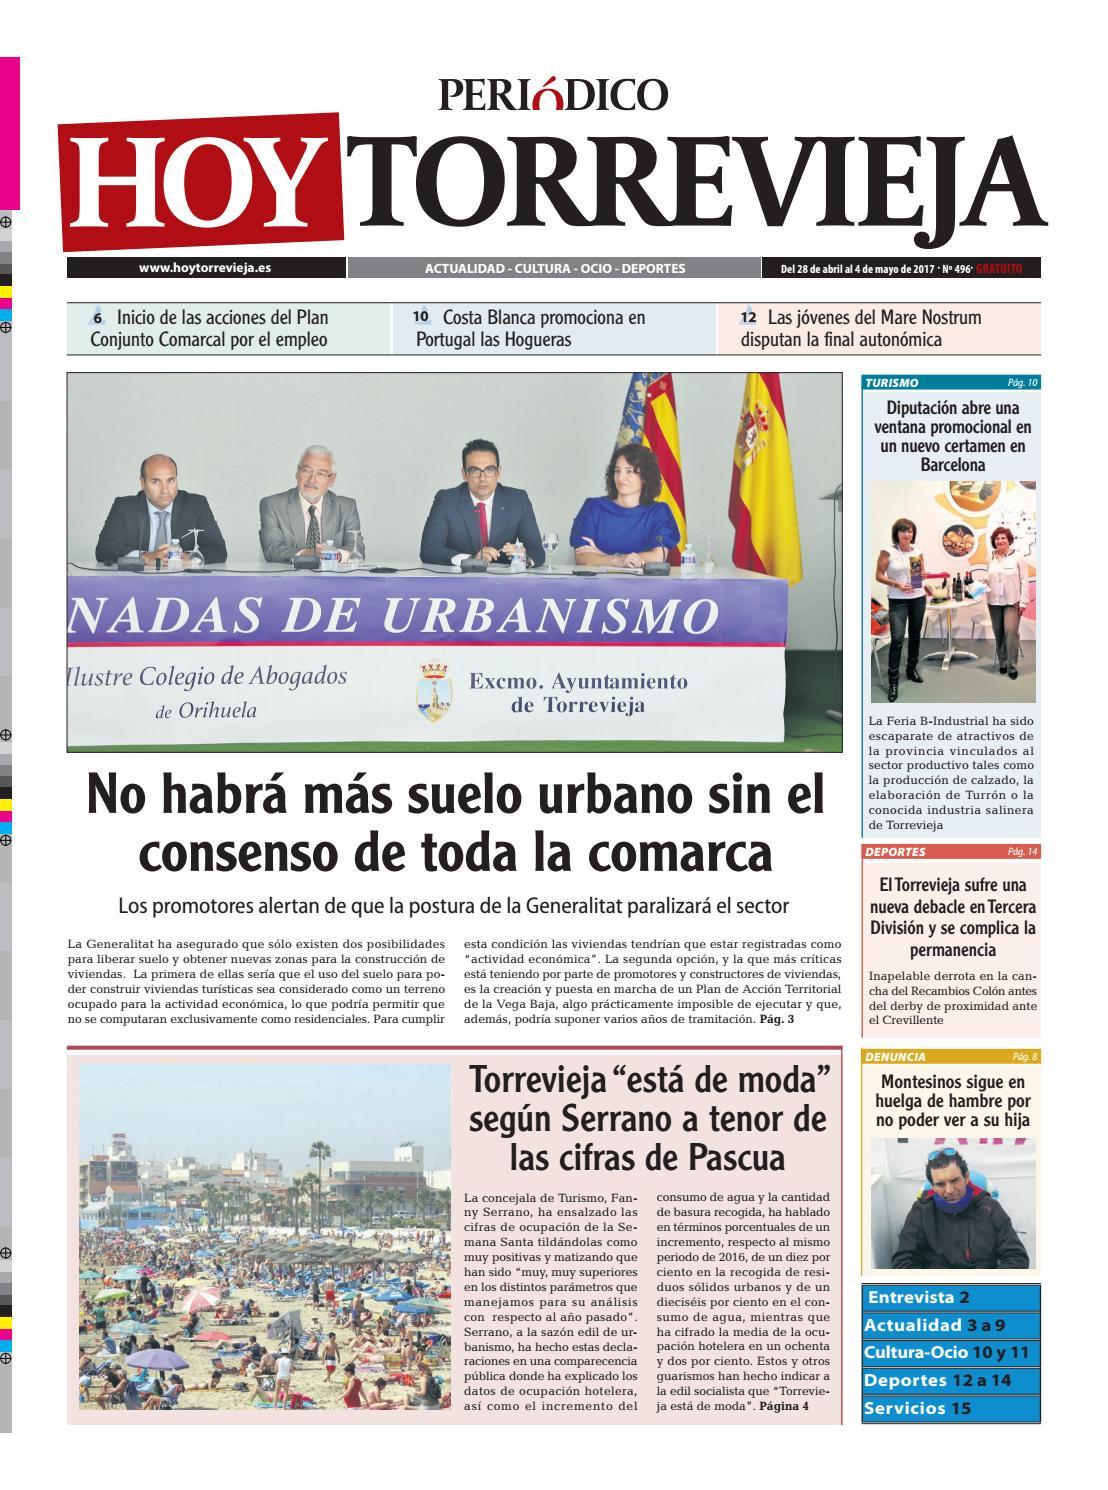 Peri Dico Hoy Torrevieja 28 4 17 N 496 By Peri Dico Hoy  # Muebles Fomento Sedavi